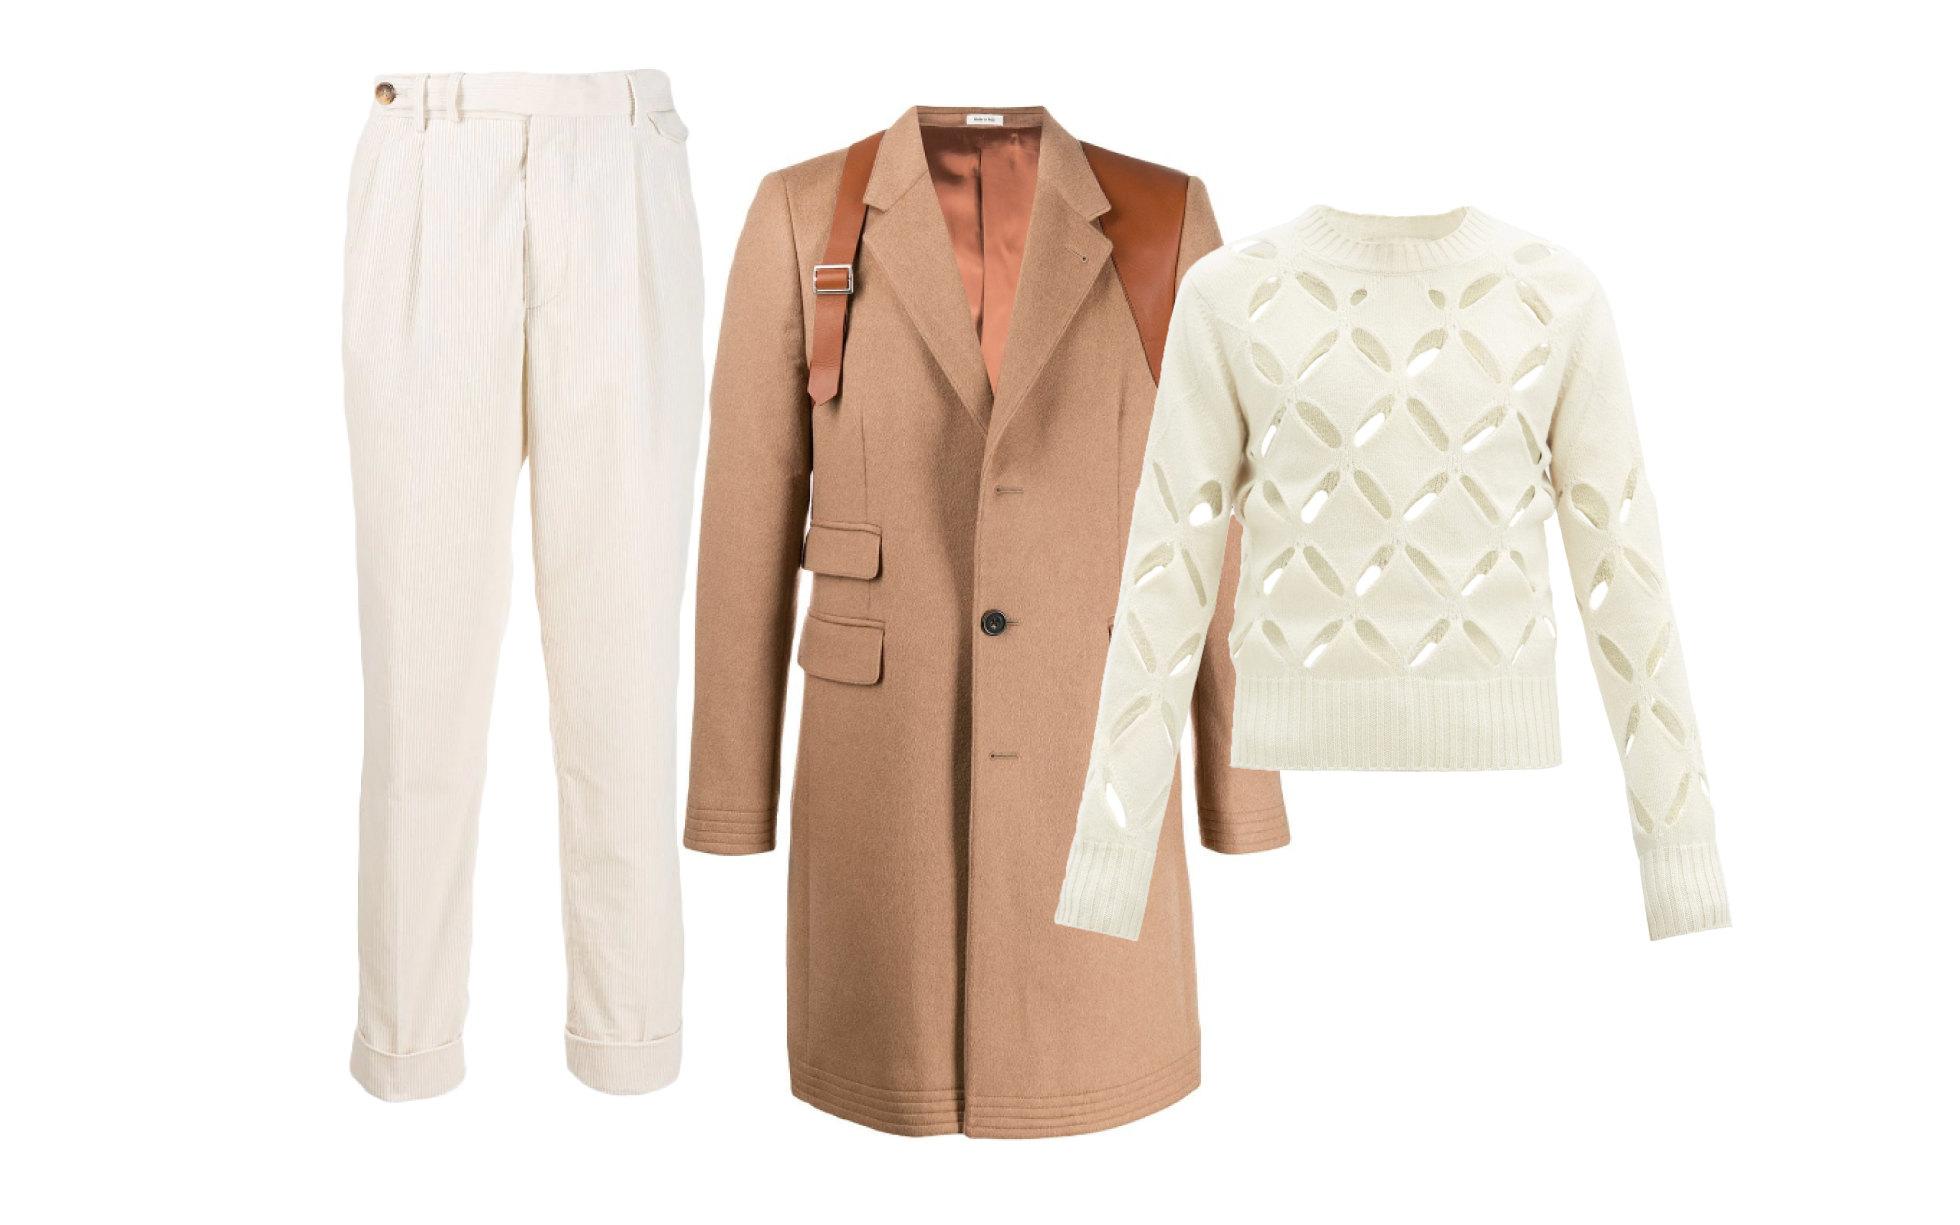 Пальто Alexander McQueen, 293 200 руб.; свитер Stefan Cooke, €639; брюки Brunello Cucinelli 64 000 руб.